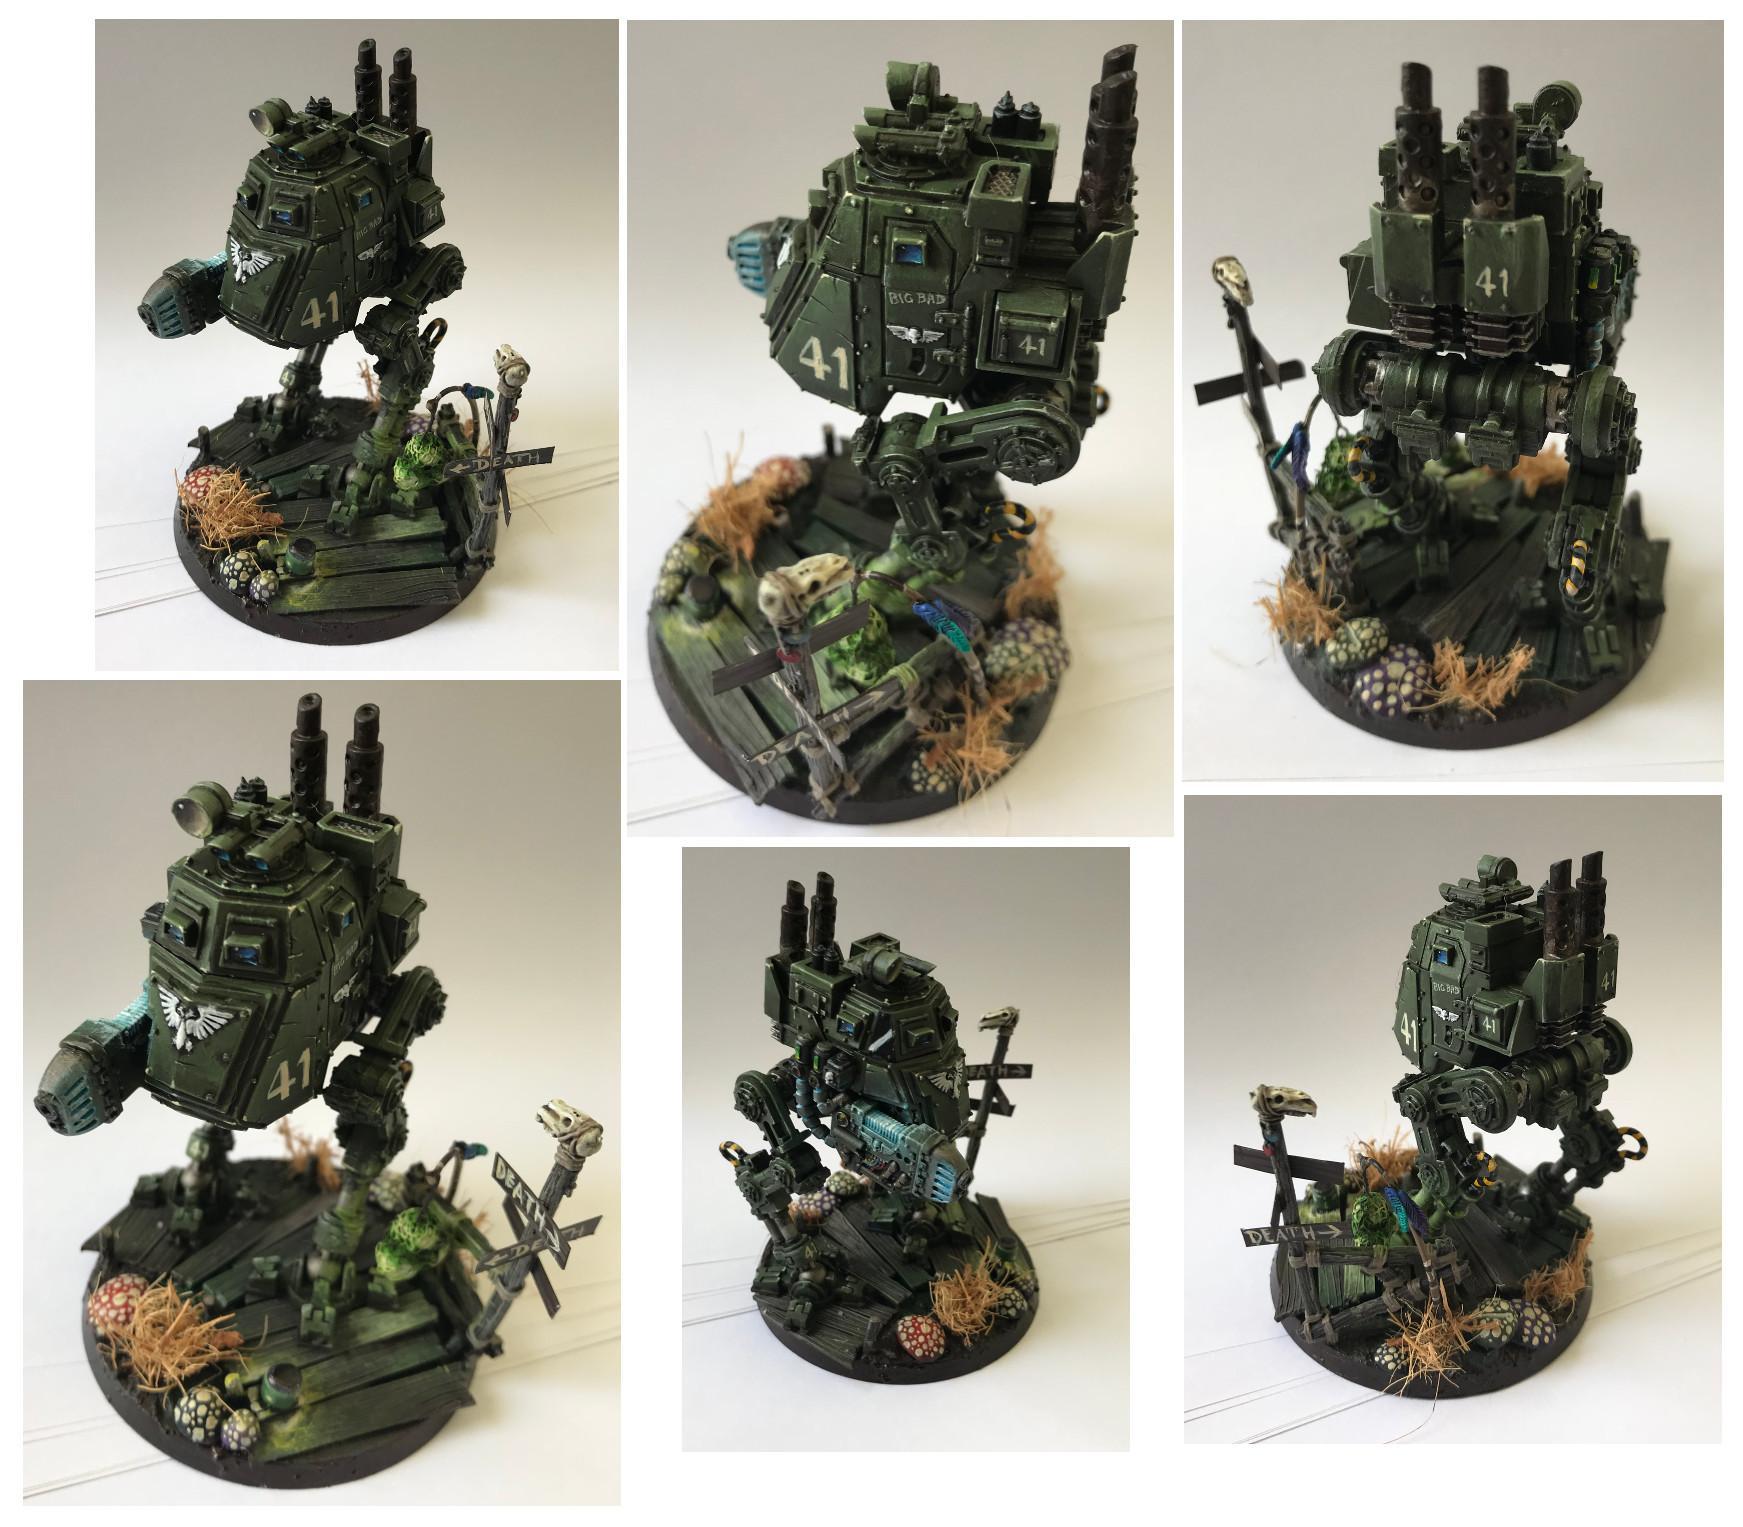 Sentinel, Sentinel 41 'Big Bad'